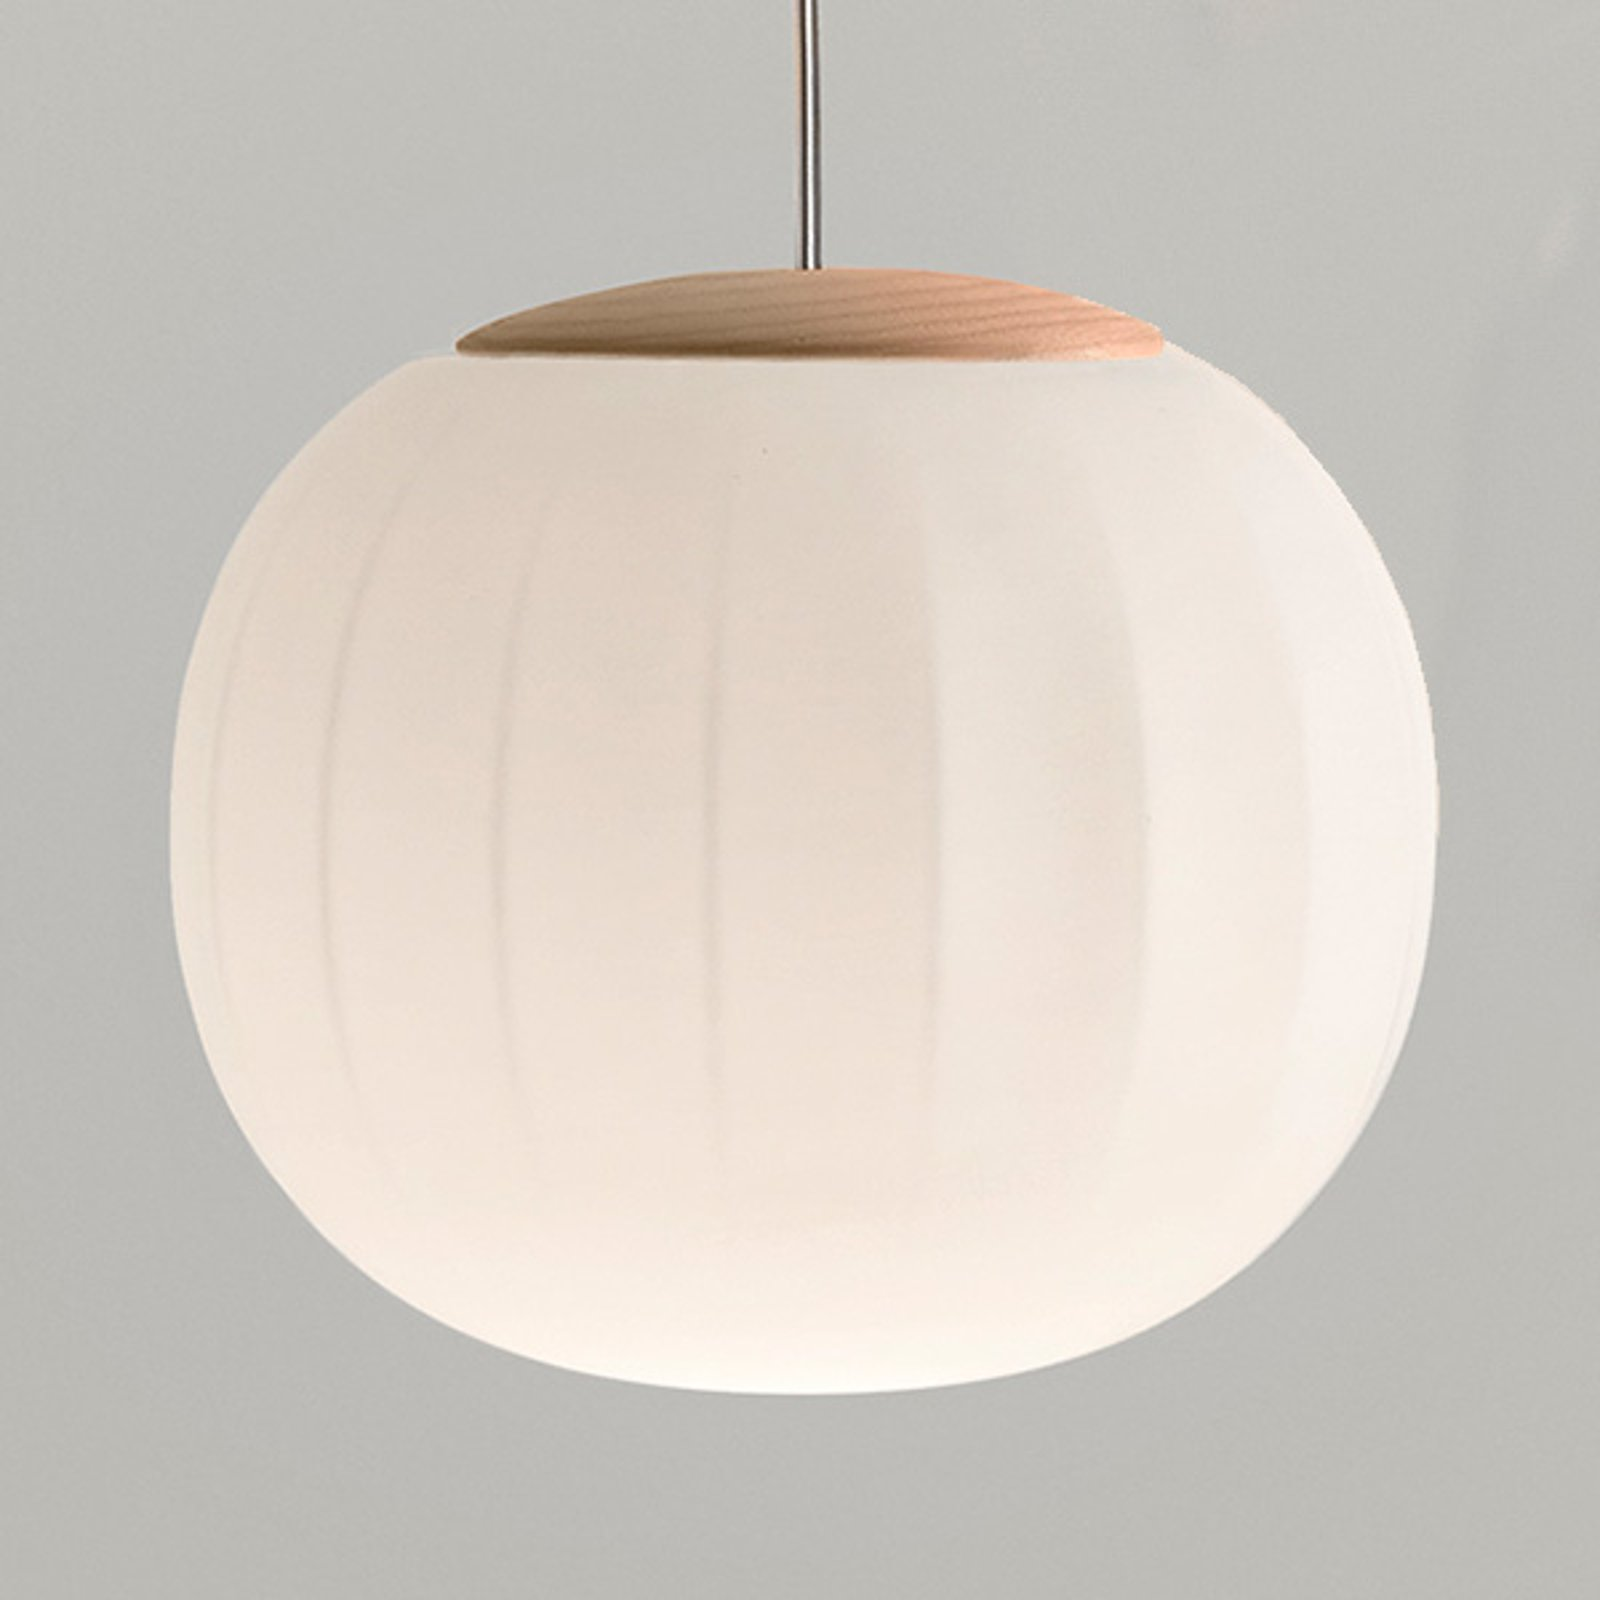 Lita pendant light ash suspension system   18 cm